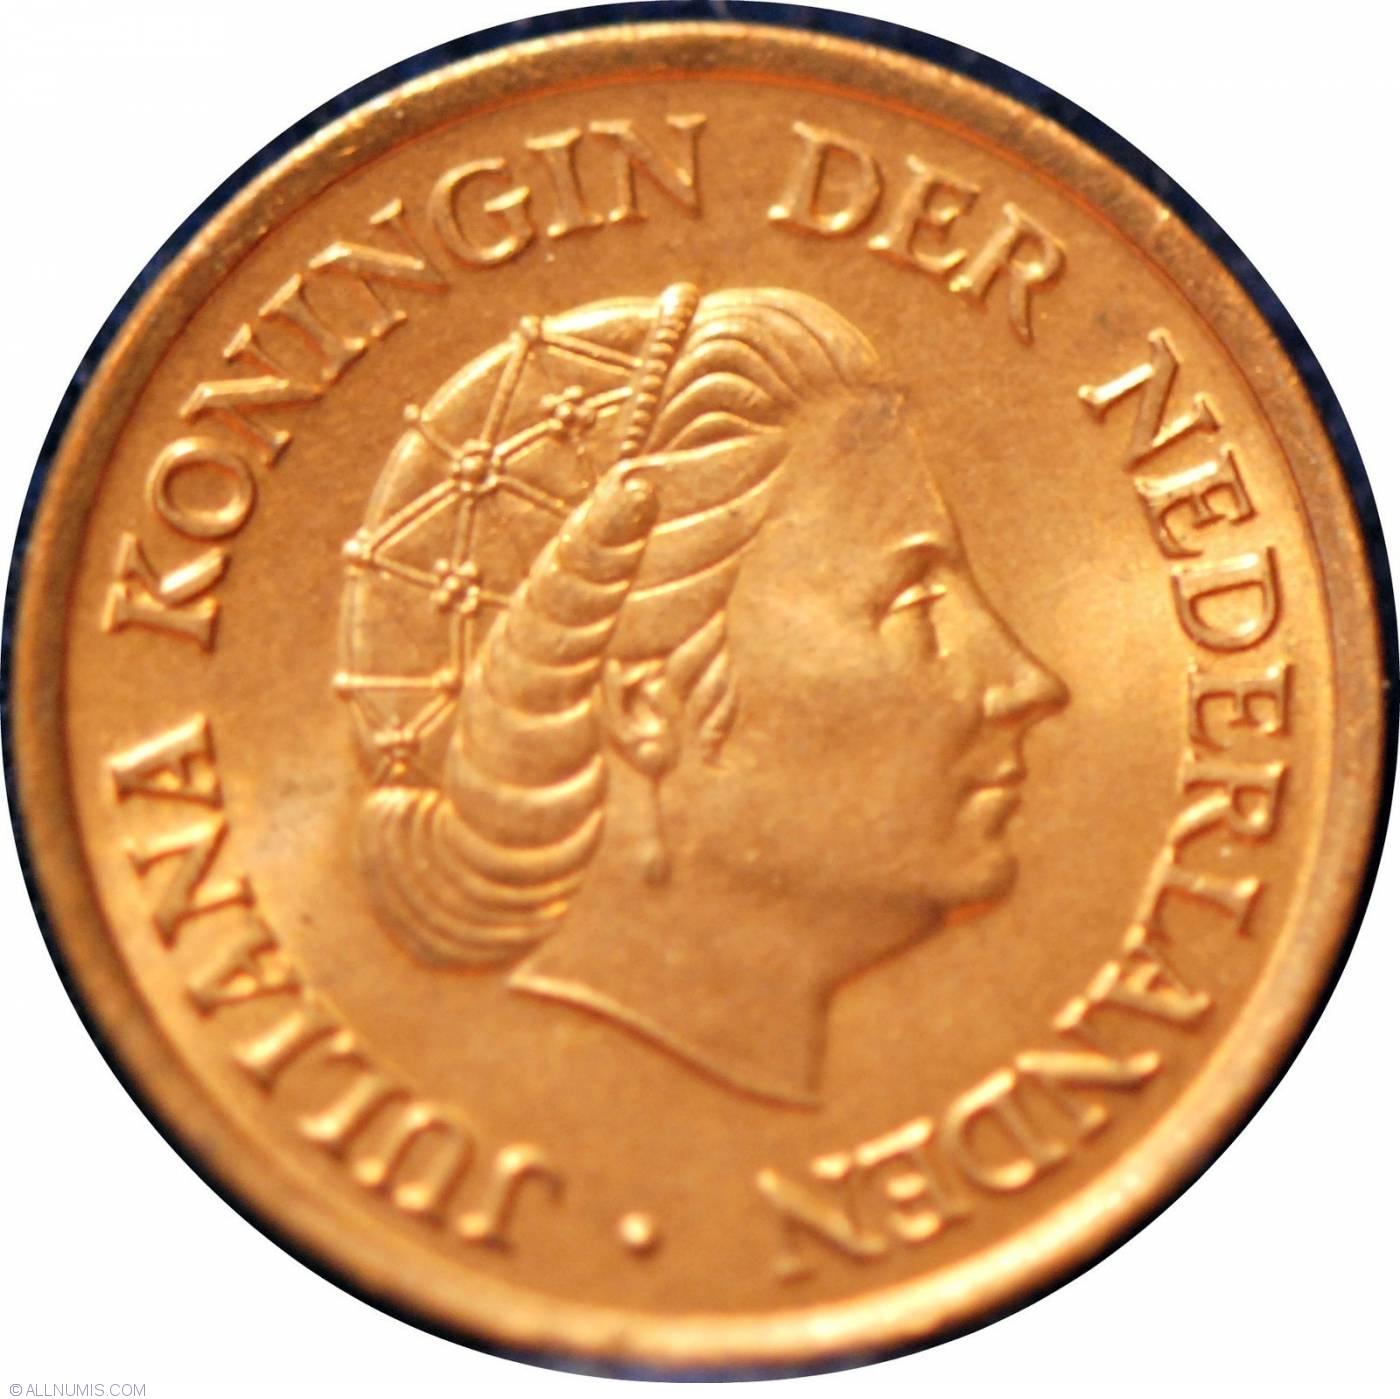 5 cent euro coin  Wikipedia